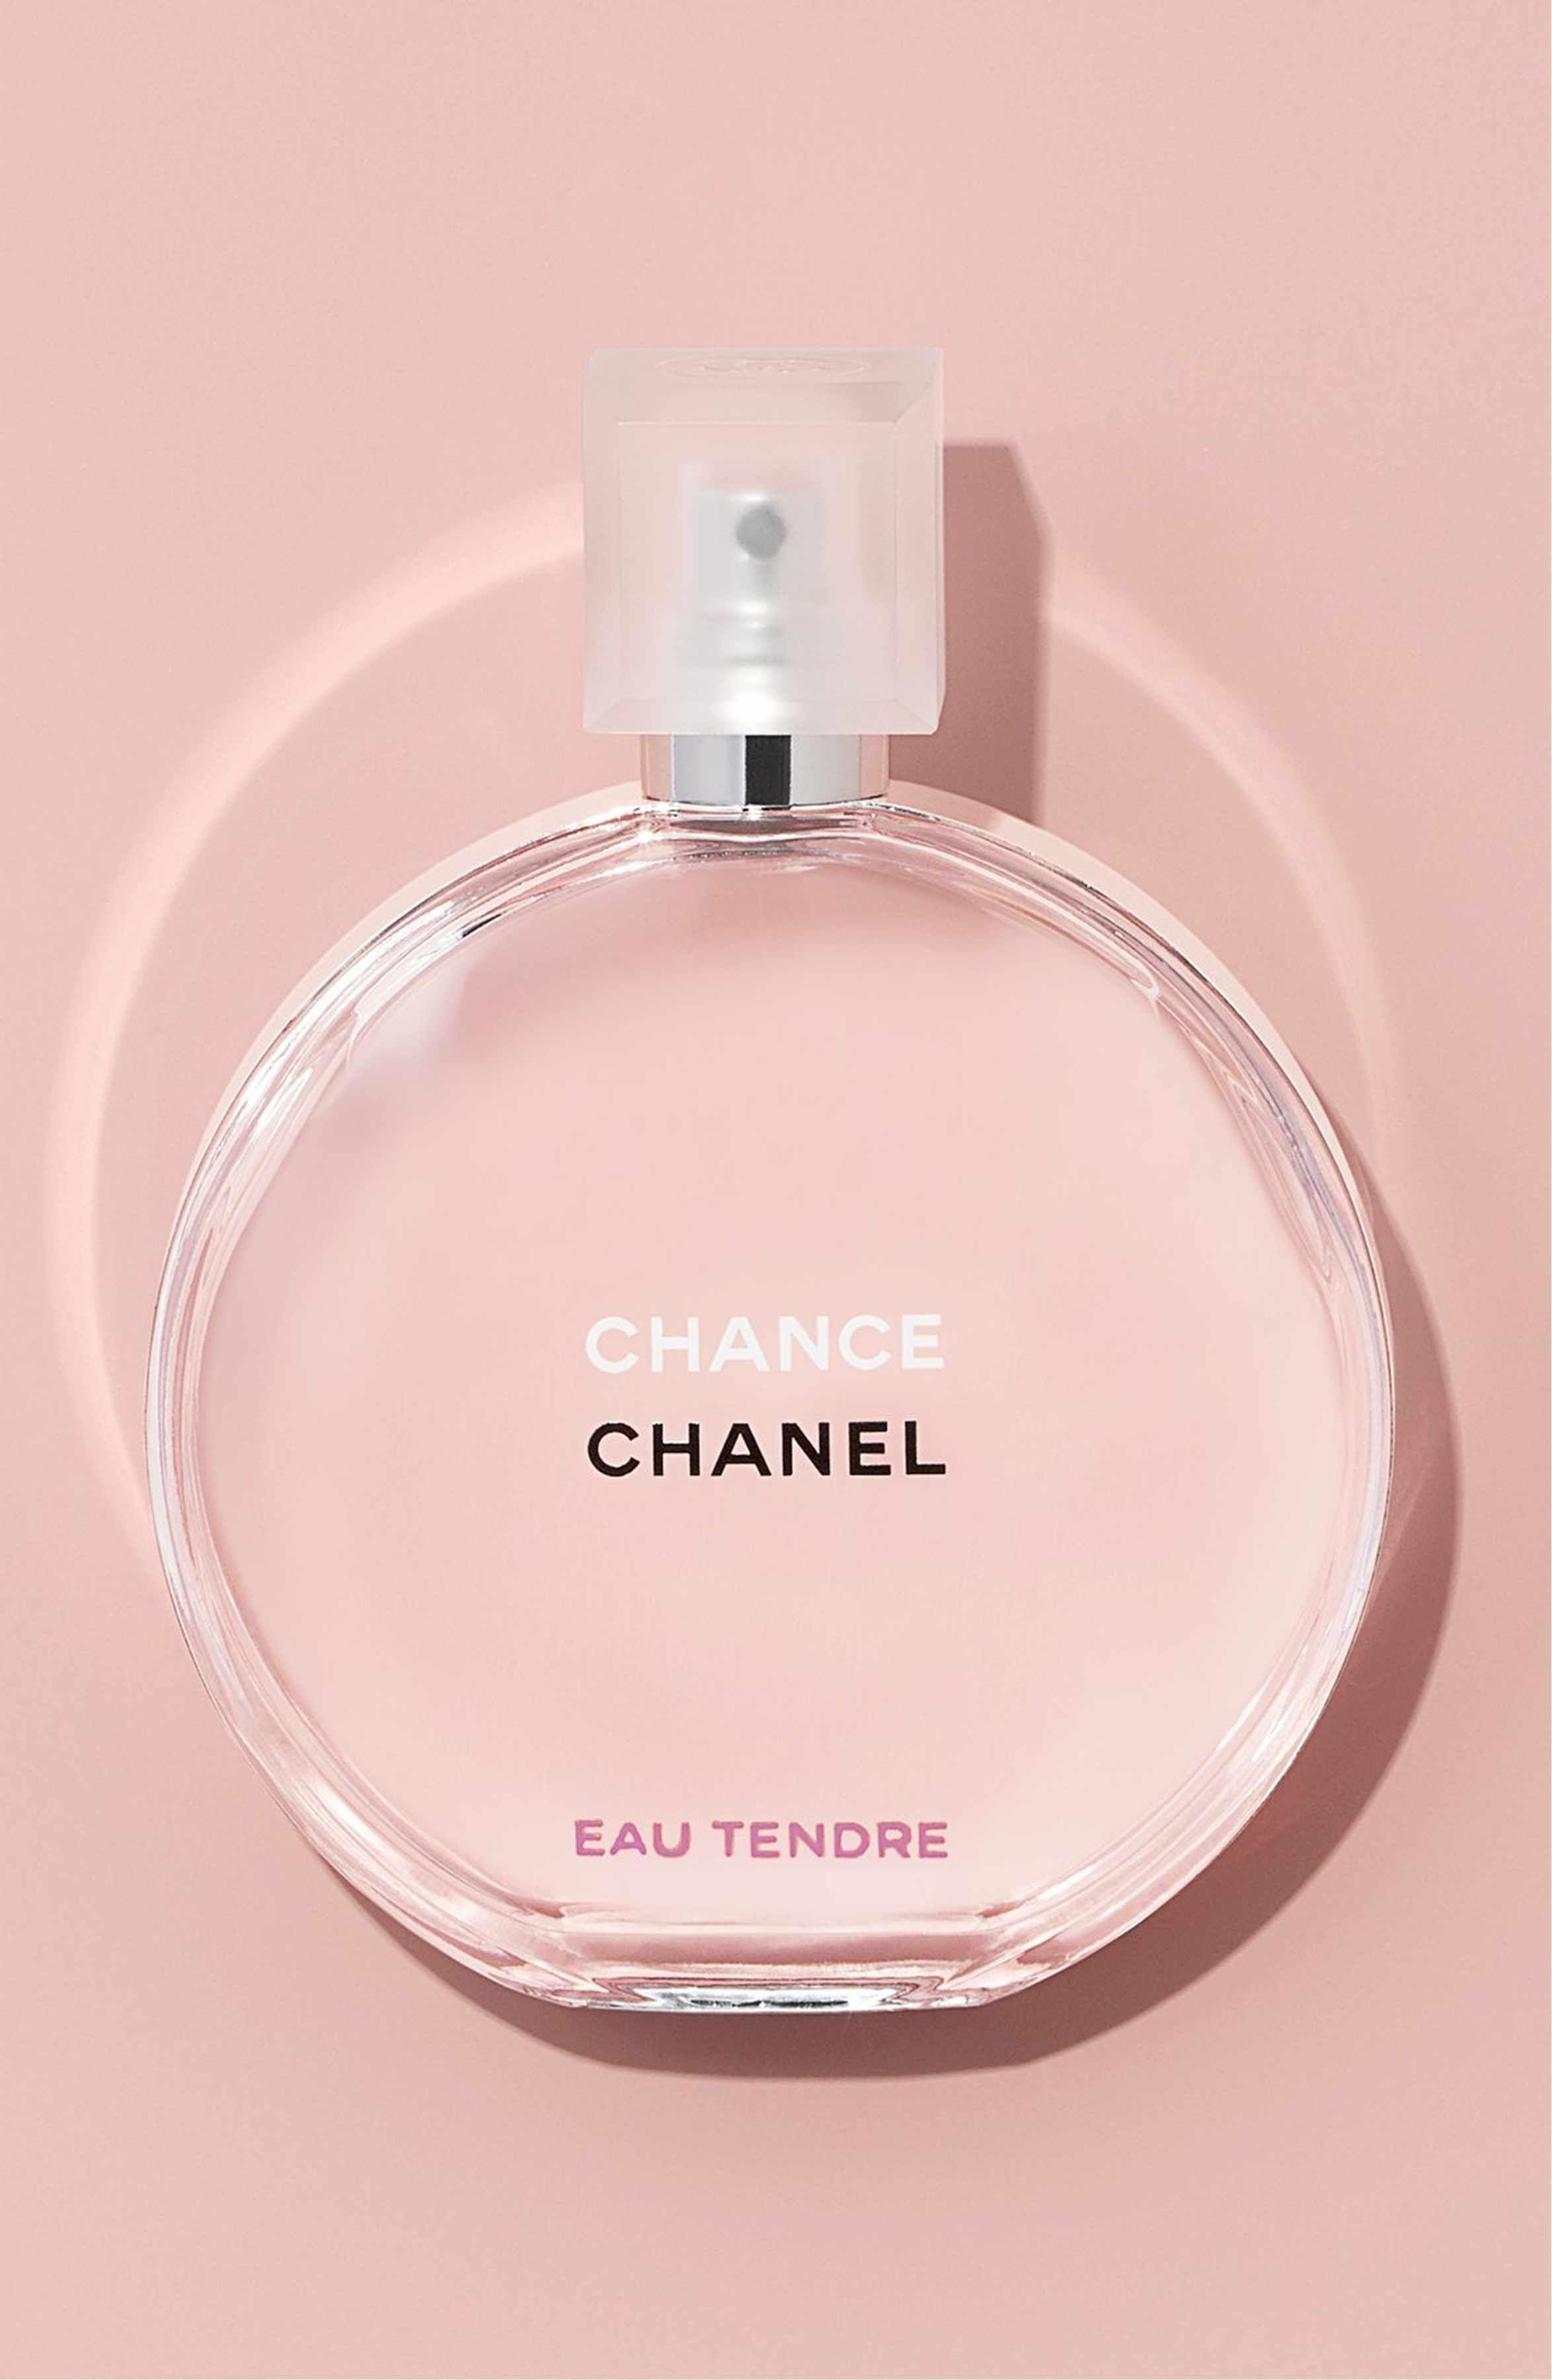 Main Image Chanel Chance Eau Tendre Eau De Toilette Spray Perfume Luxury Perfume Diptyque Perfume